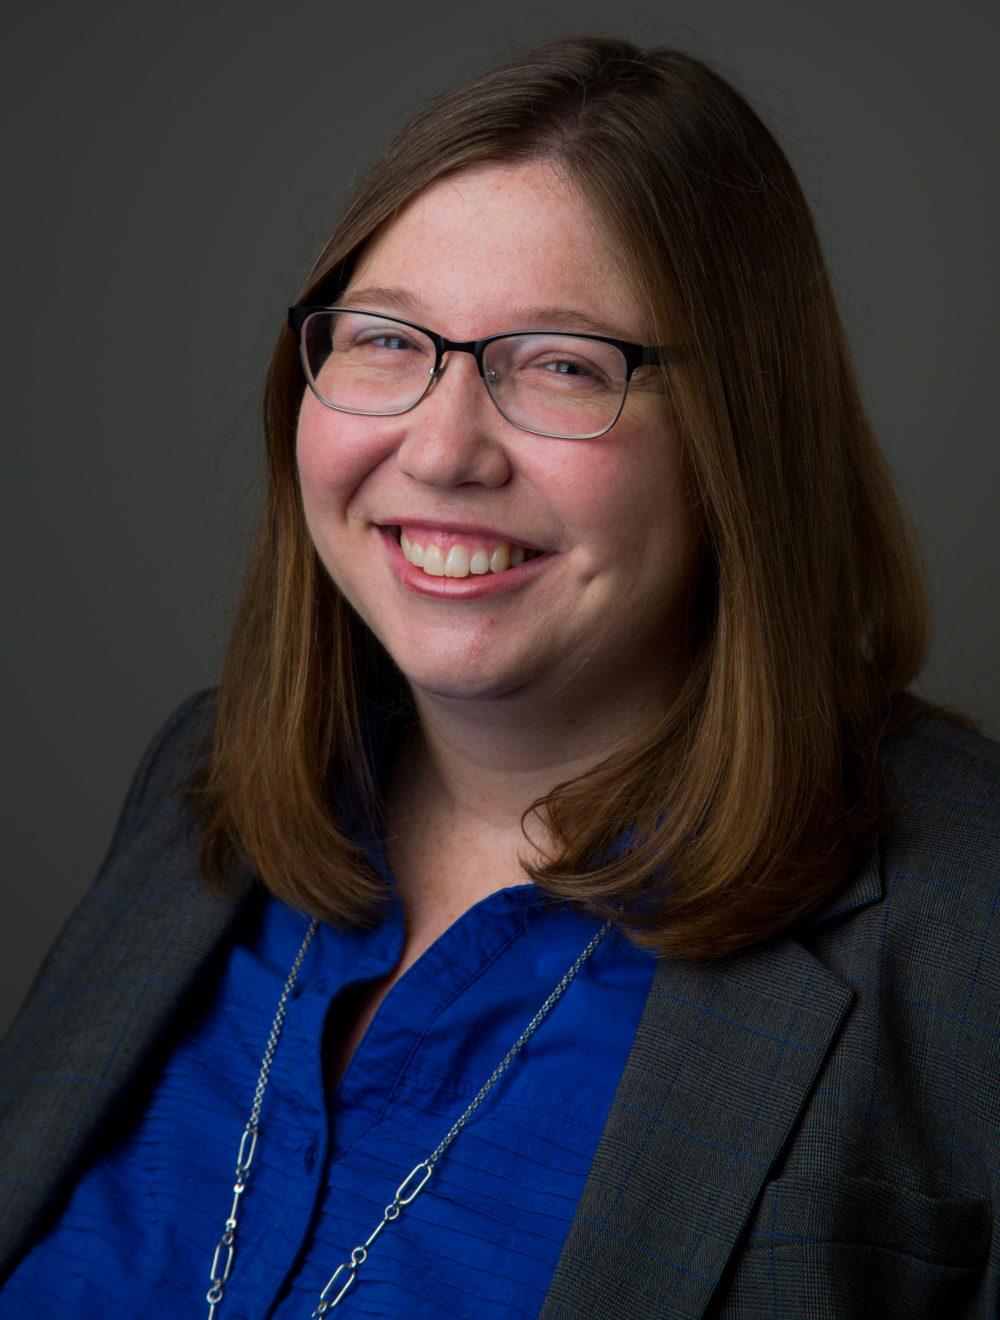 Dr. Debra Leiter